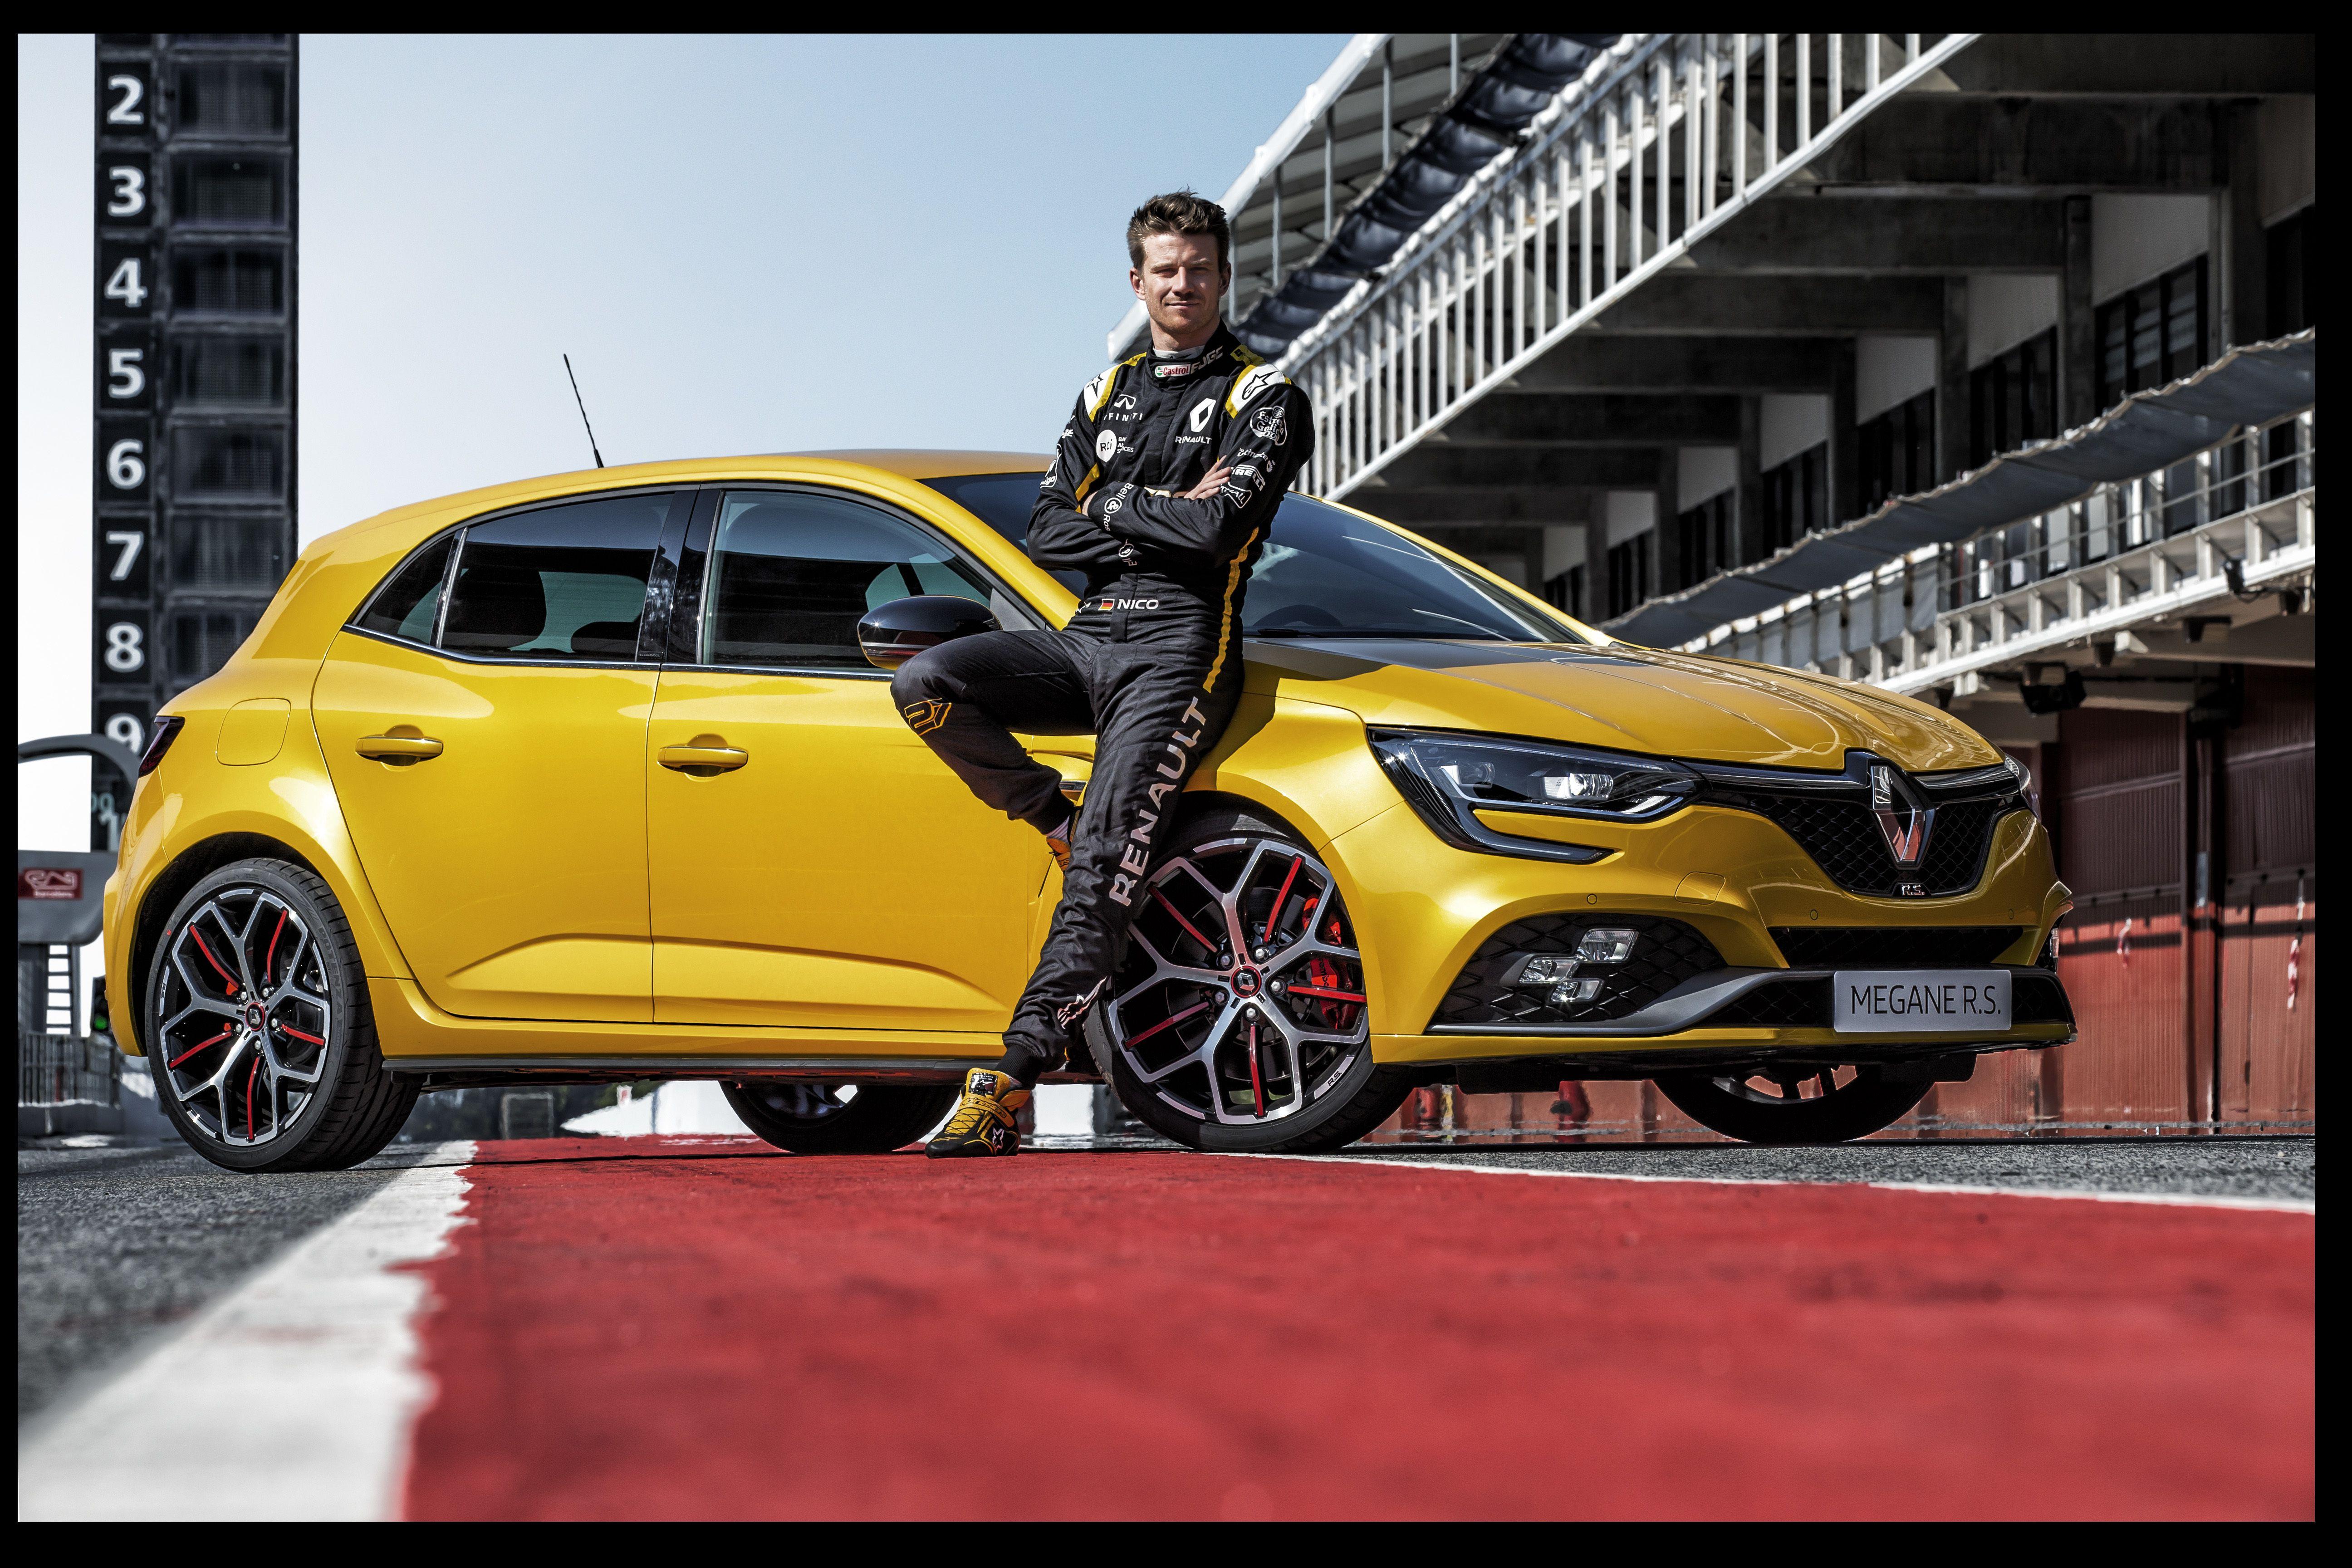 Renault Megane R S Trophy Biler Bil